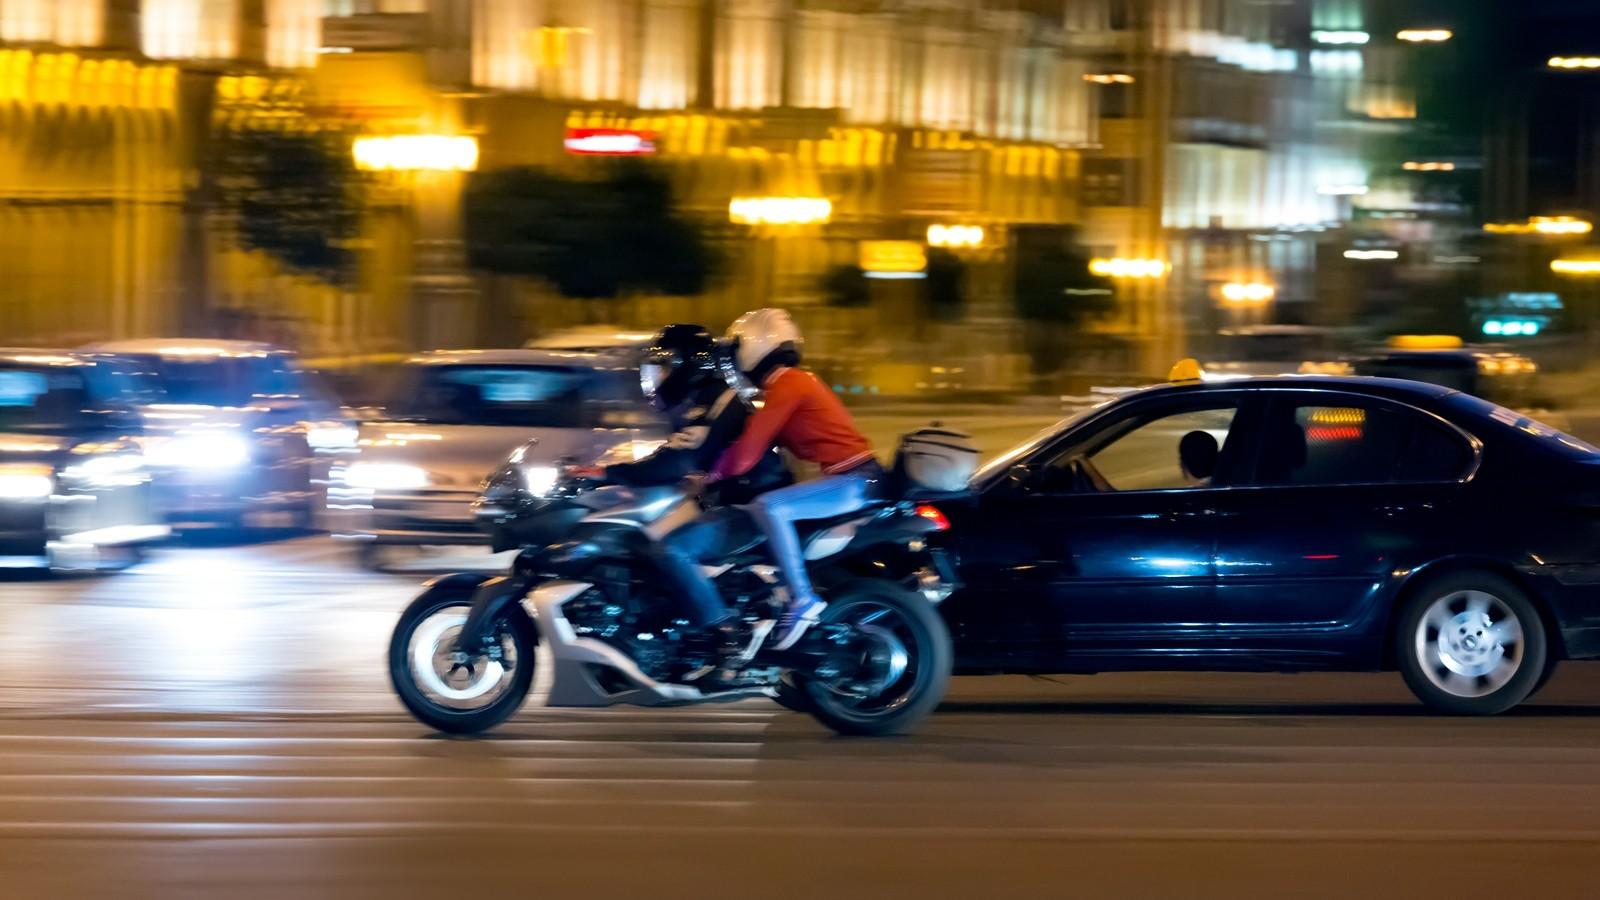 Motorcyclist on street at night